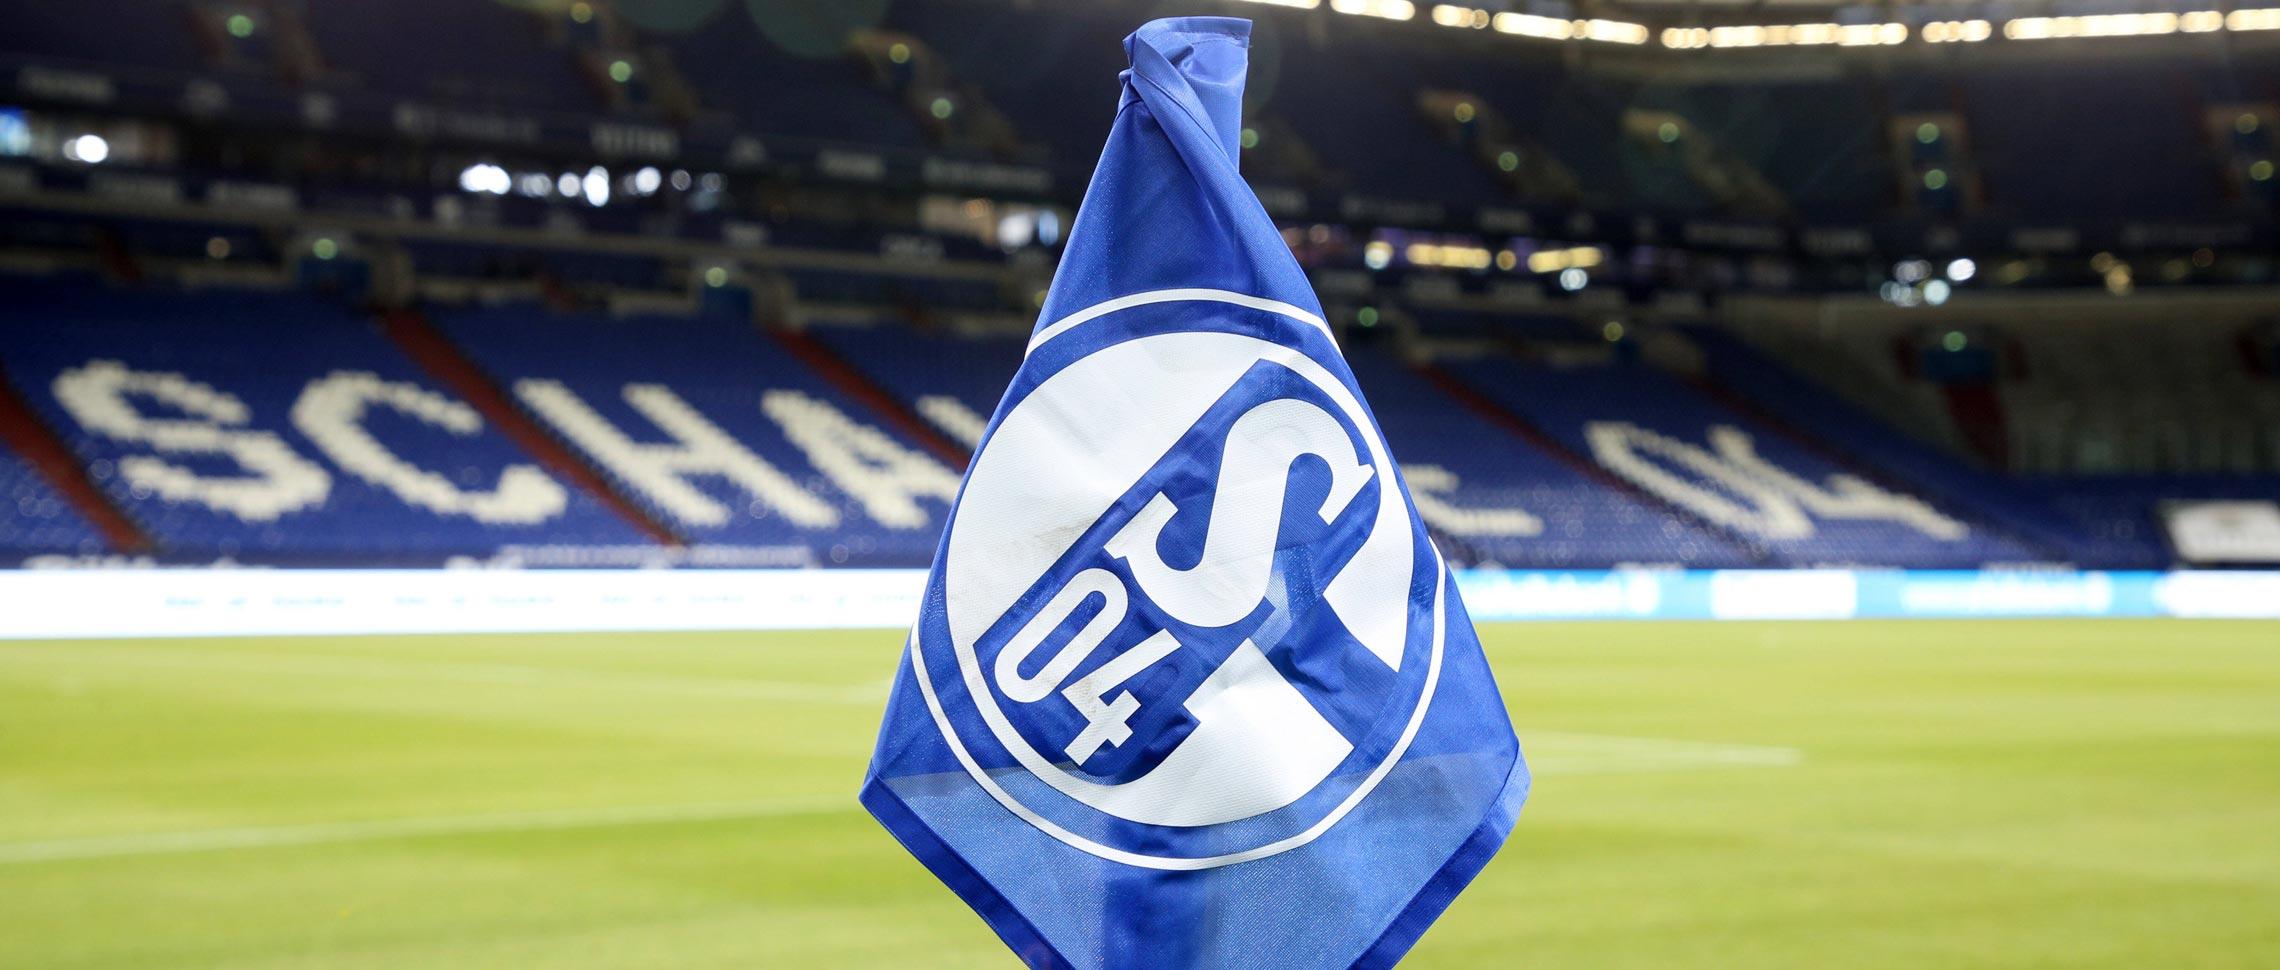 Hoffenheim Schalke Tickets